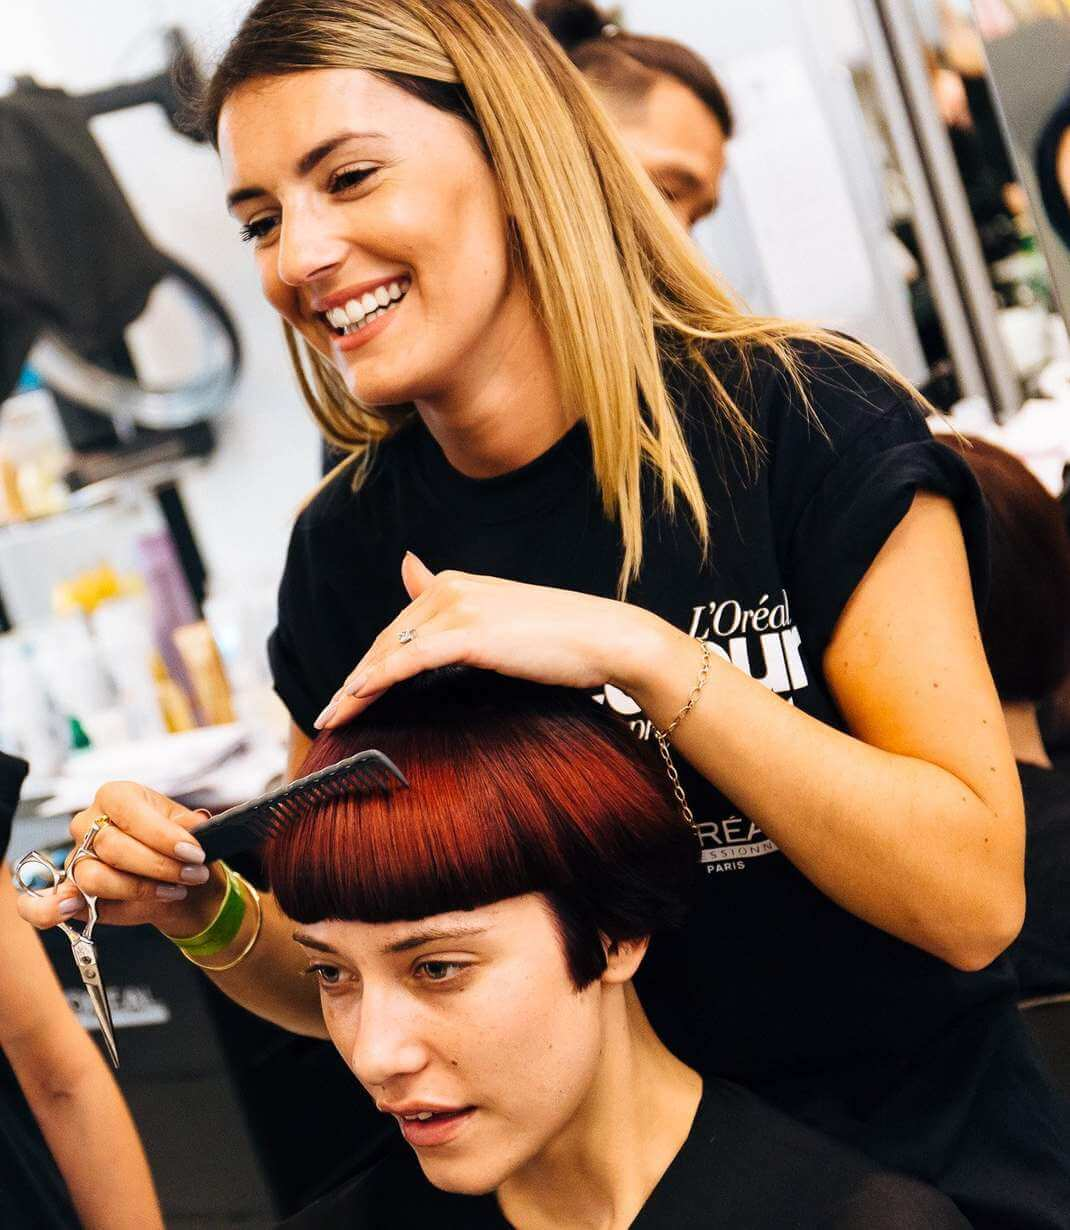 SimpliField's beauty industry solutions